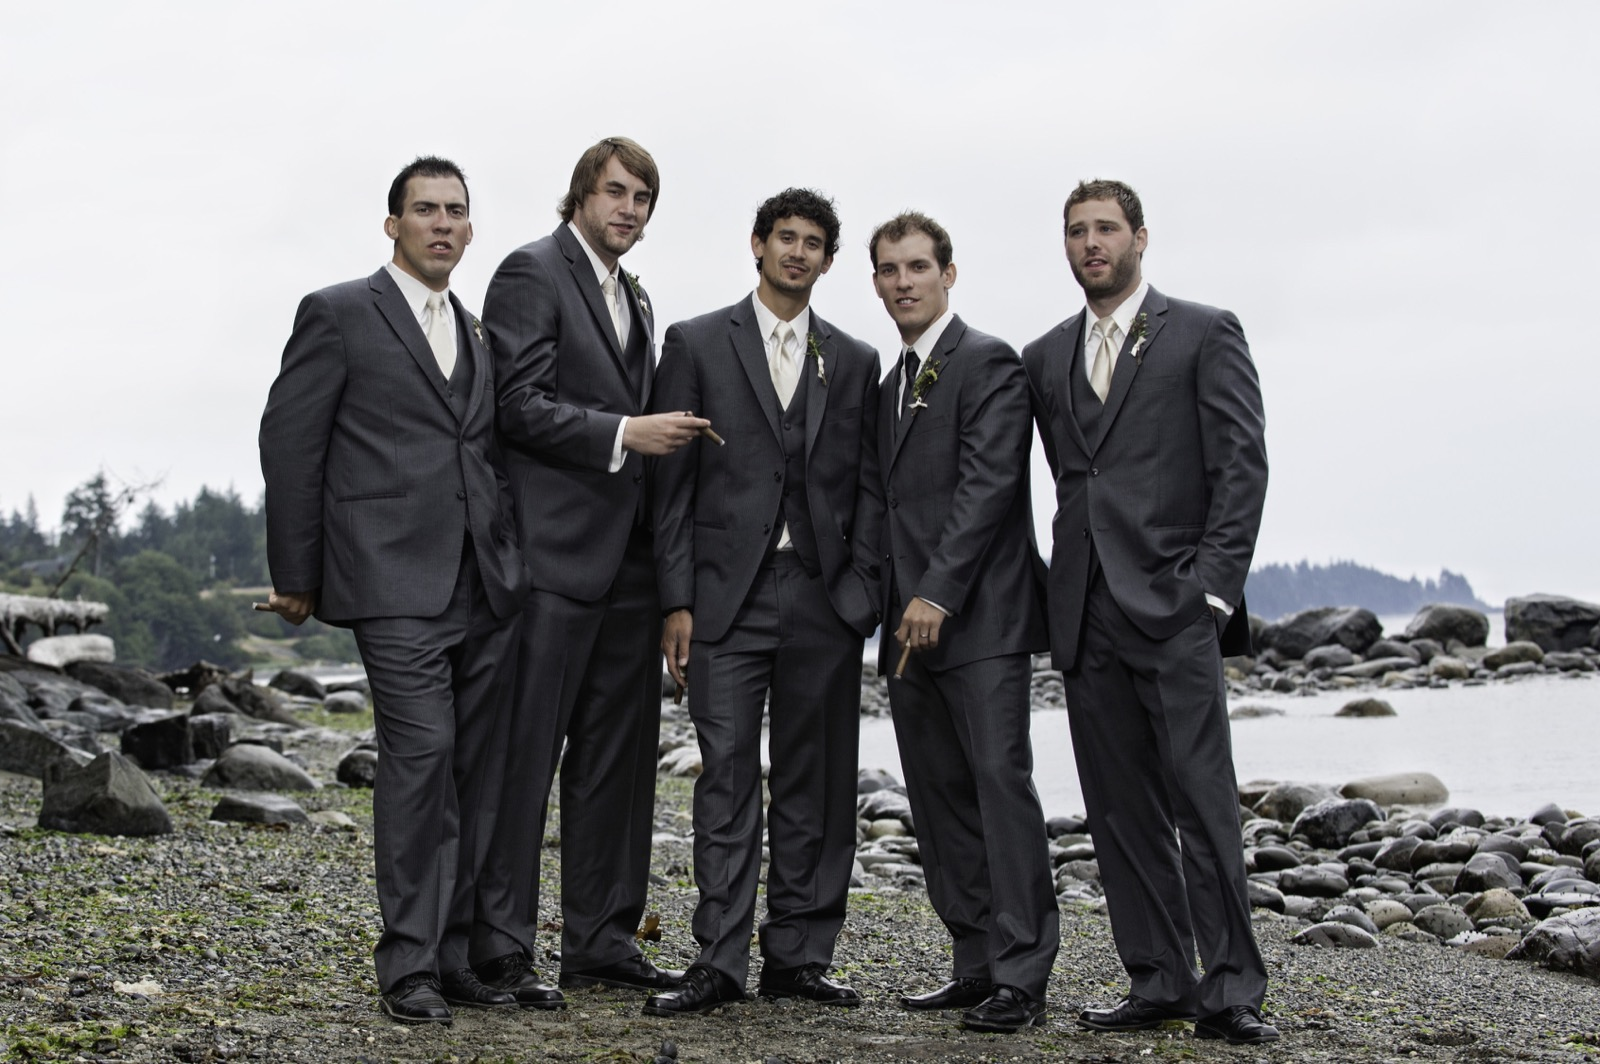 sooke-wedding-photographers-craidelonna-oceanedge-lodge-wedding-71.jpg